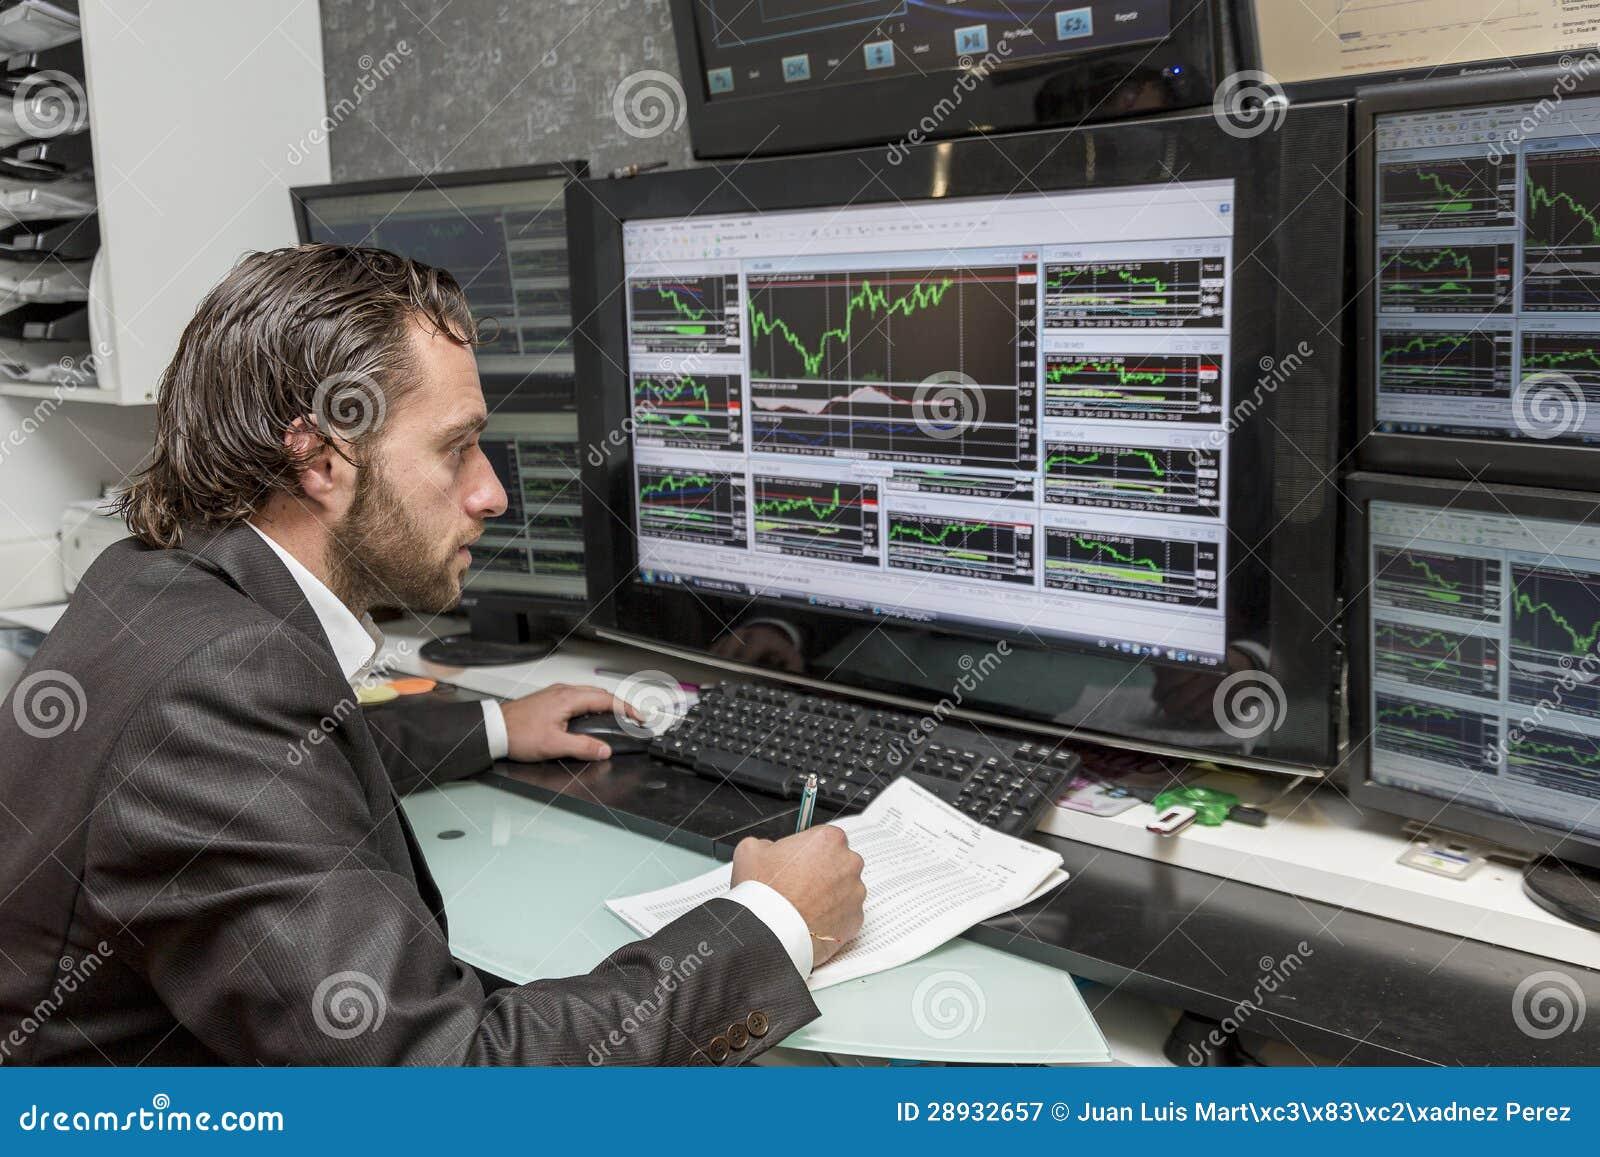 Traider бездепозитные бонусы форекс на forex отзывы